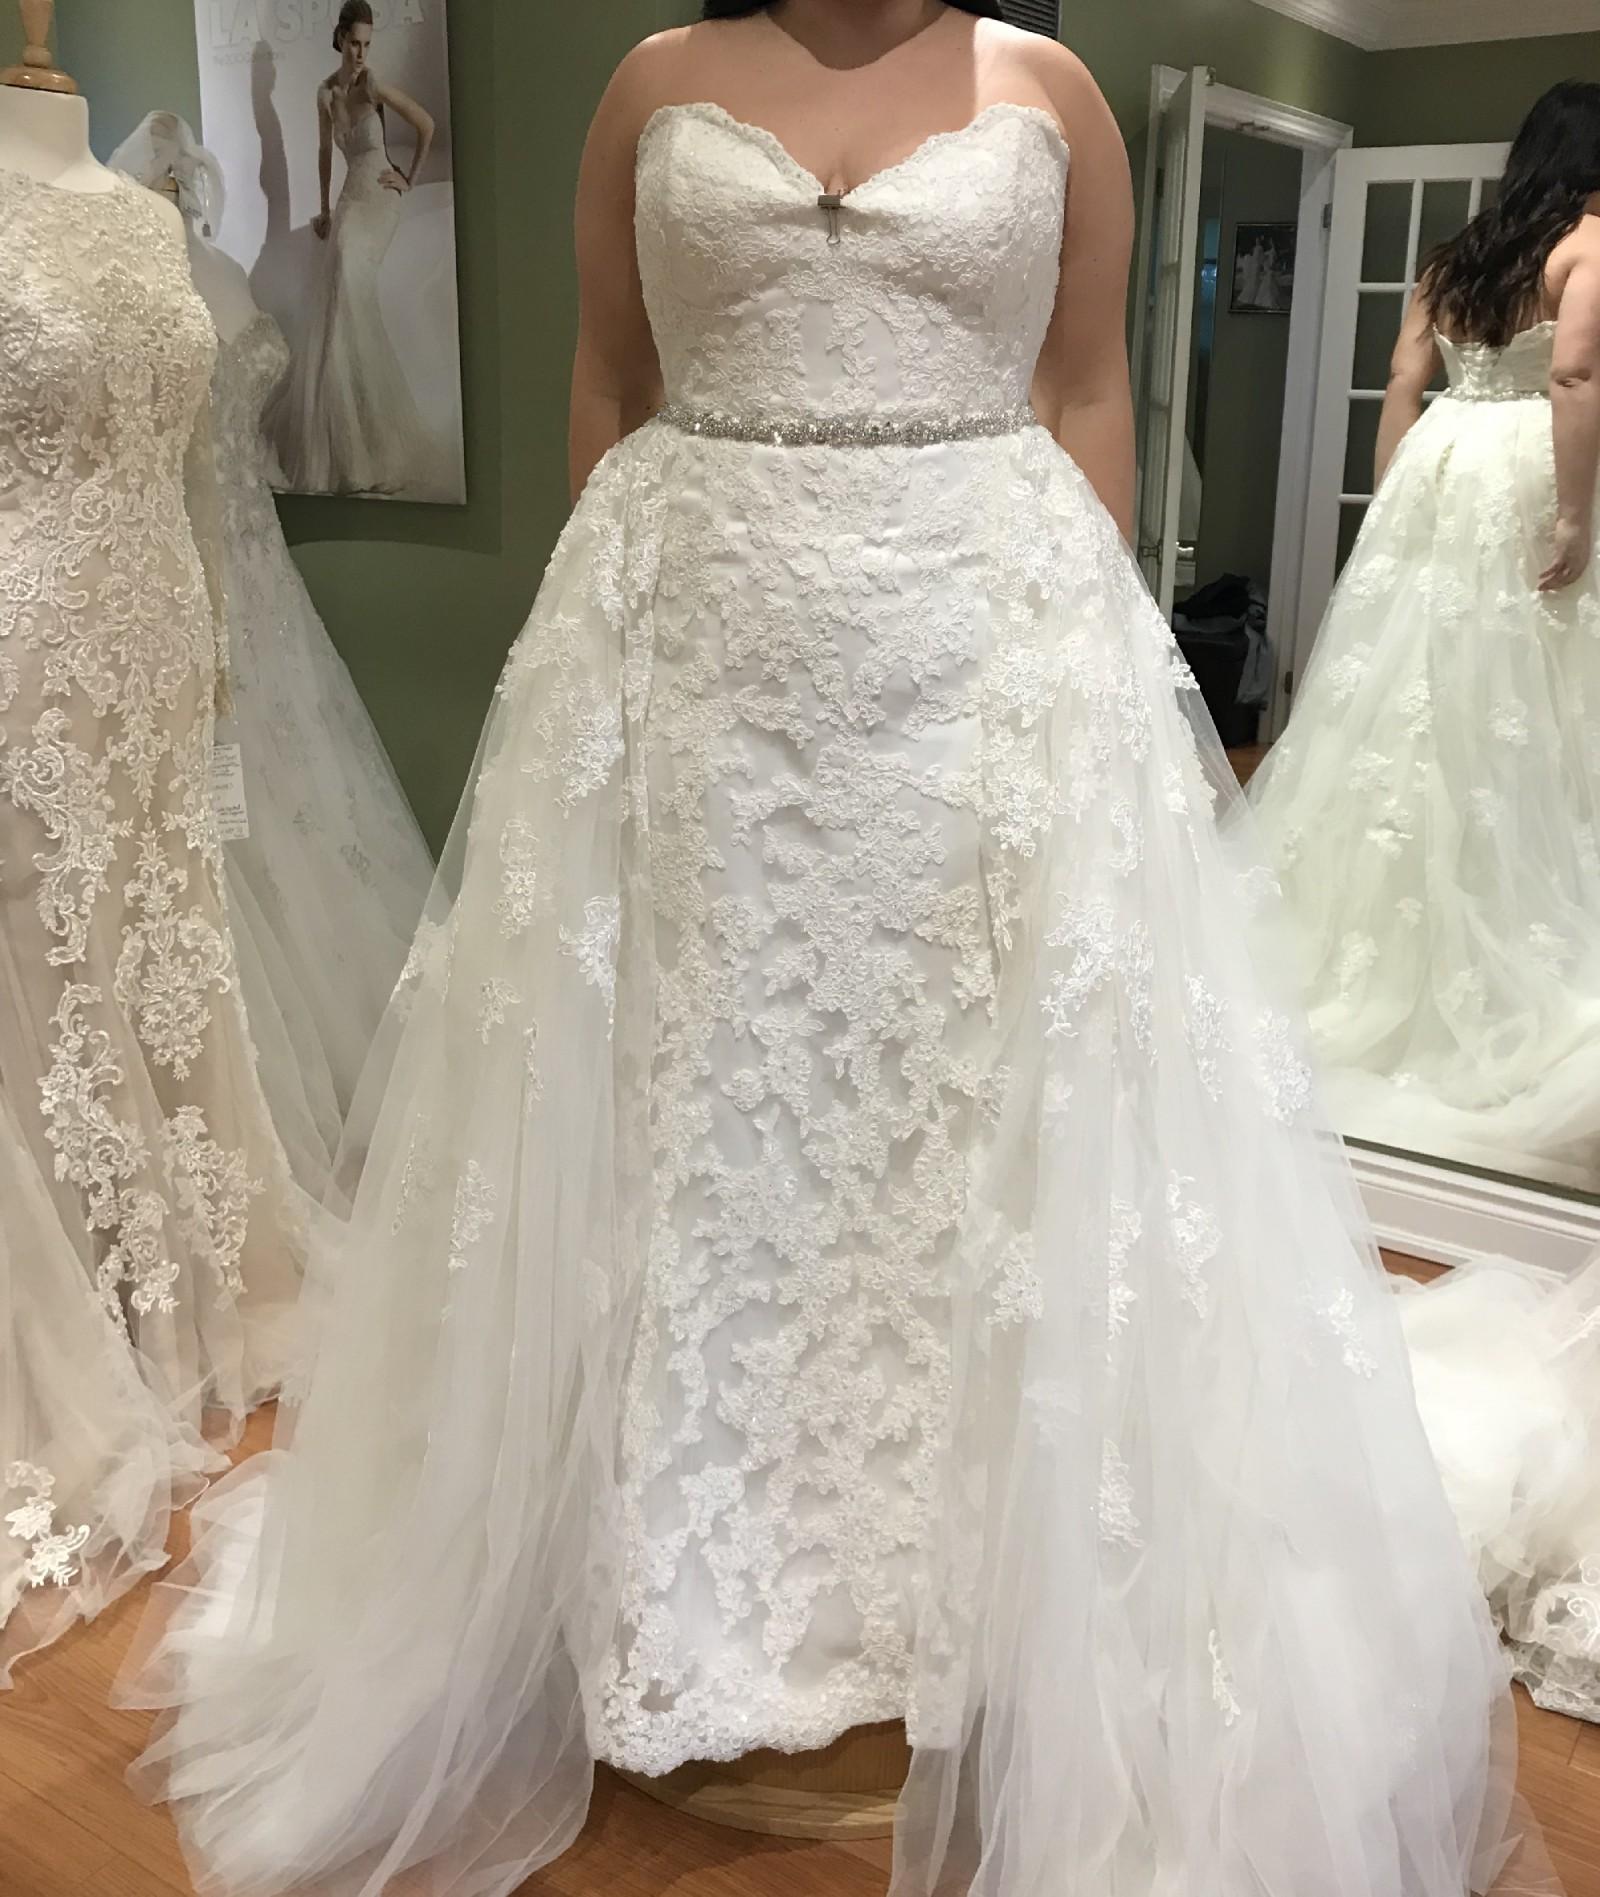 Maggie Sottero 12003555 & 164256118 New Wedding Dress On